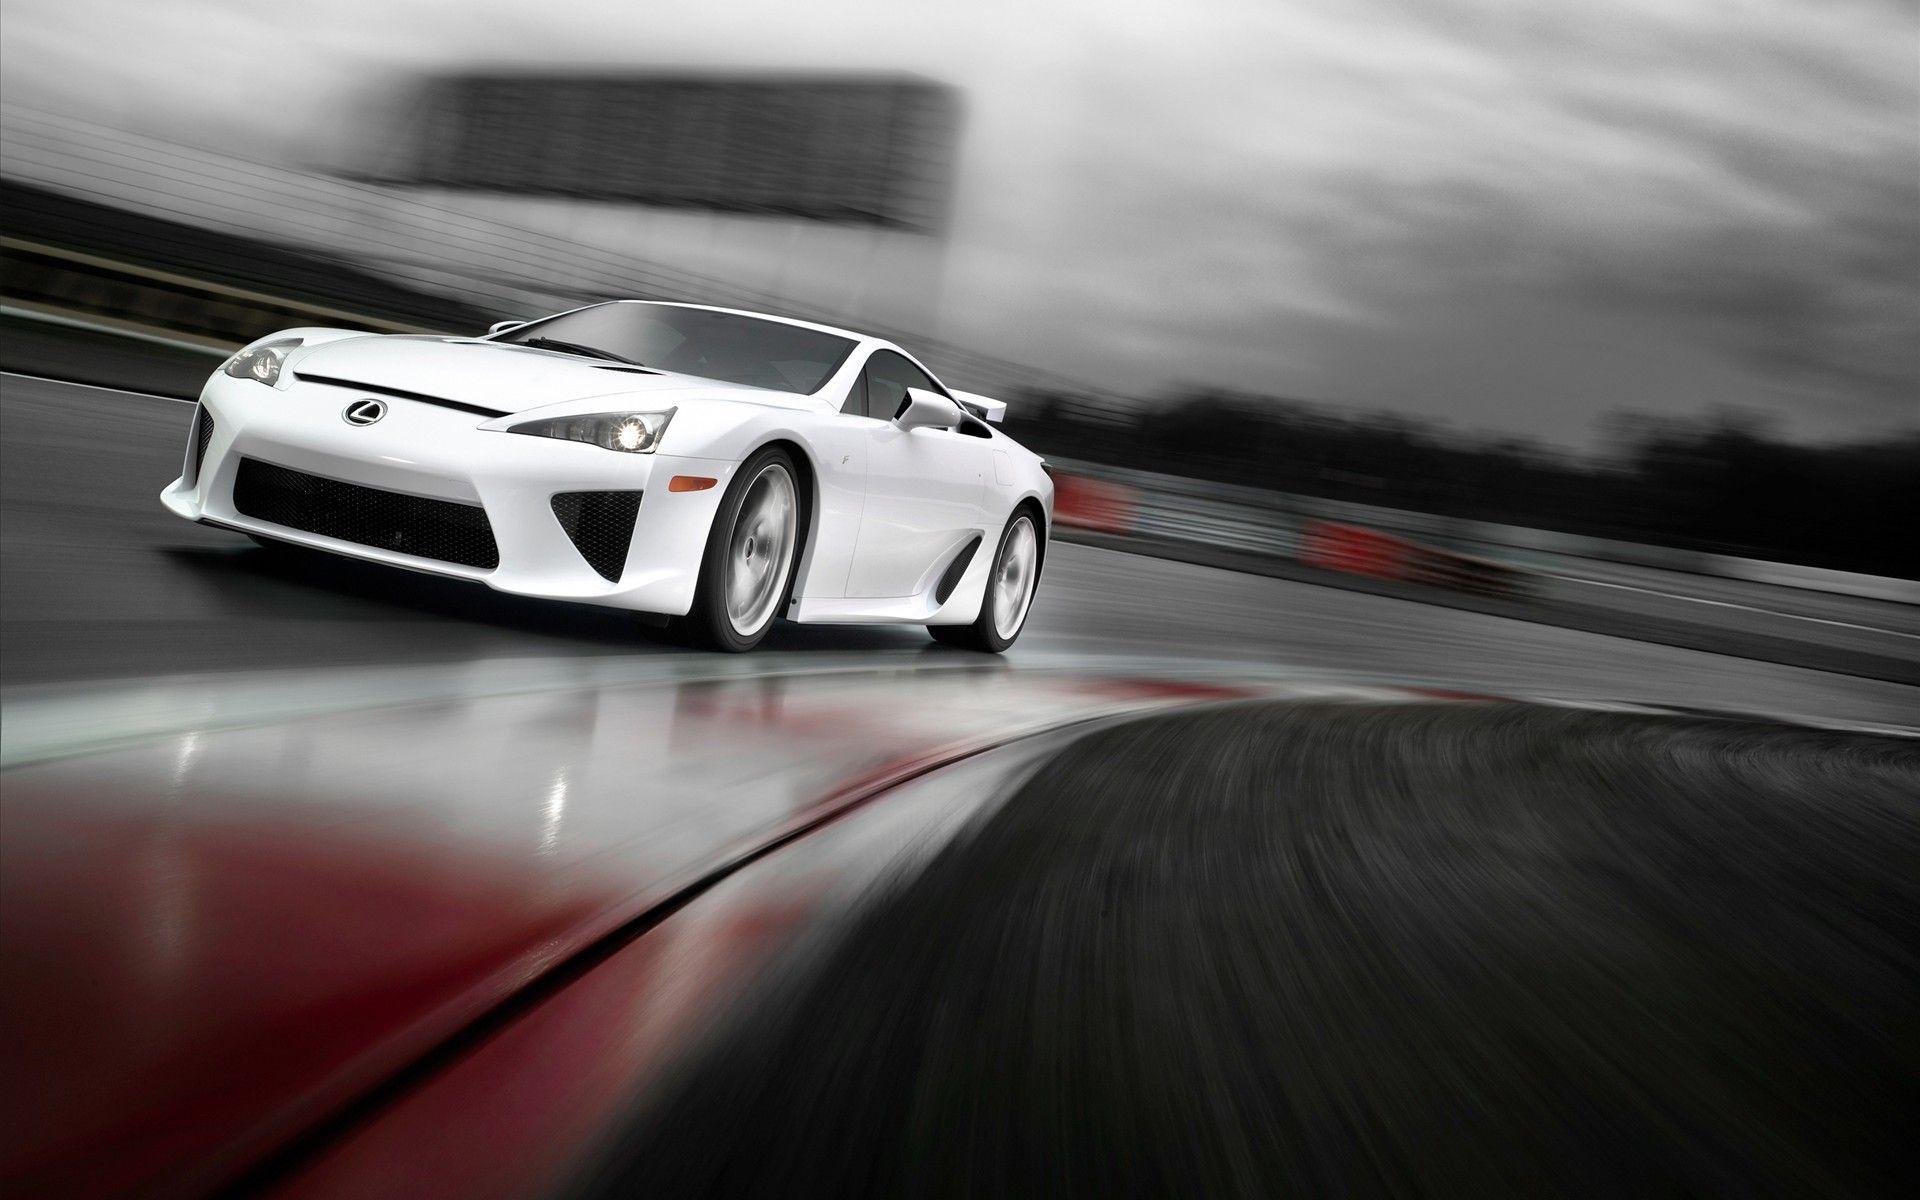 Lexus Lfa Lexus Lfa Lexus Cars Super Cars